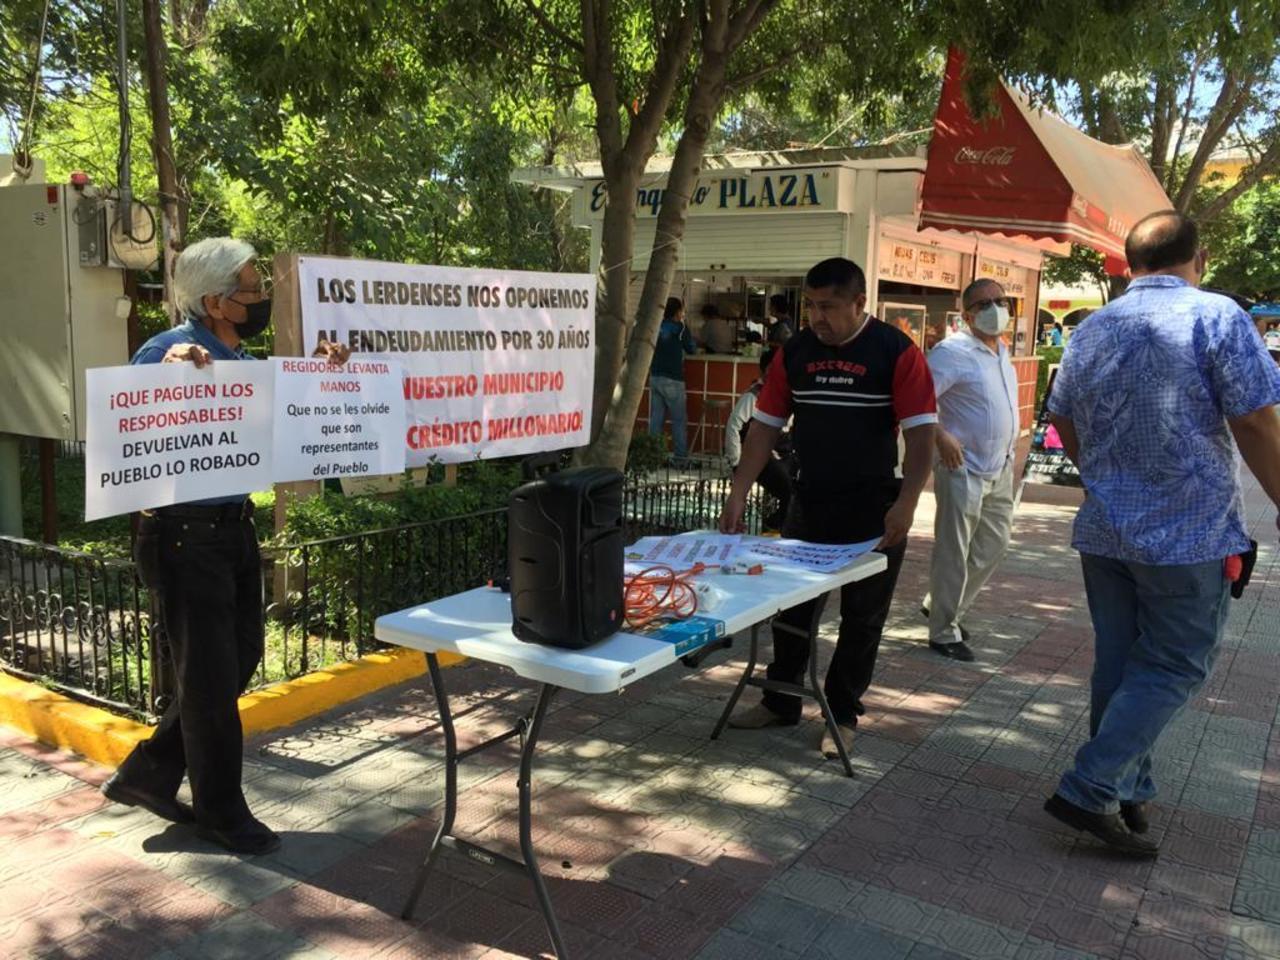 Buscan firmas para impedir solicitud de crédito de Lerdo